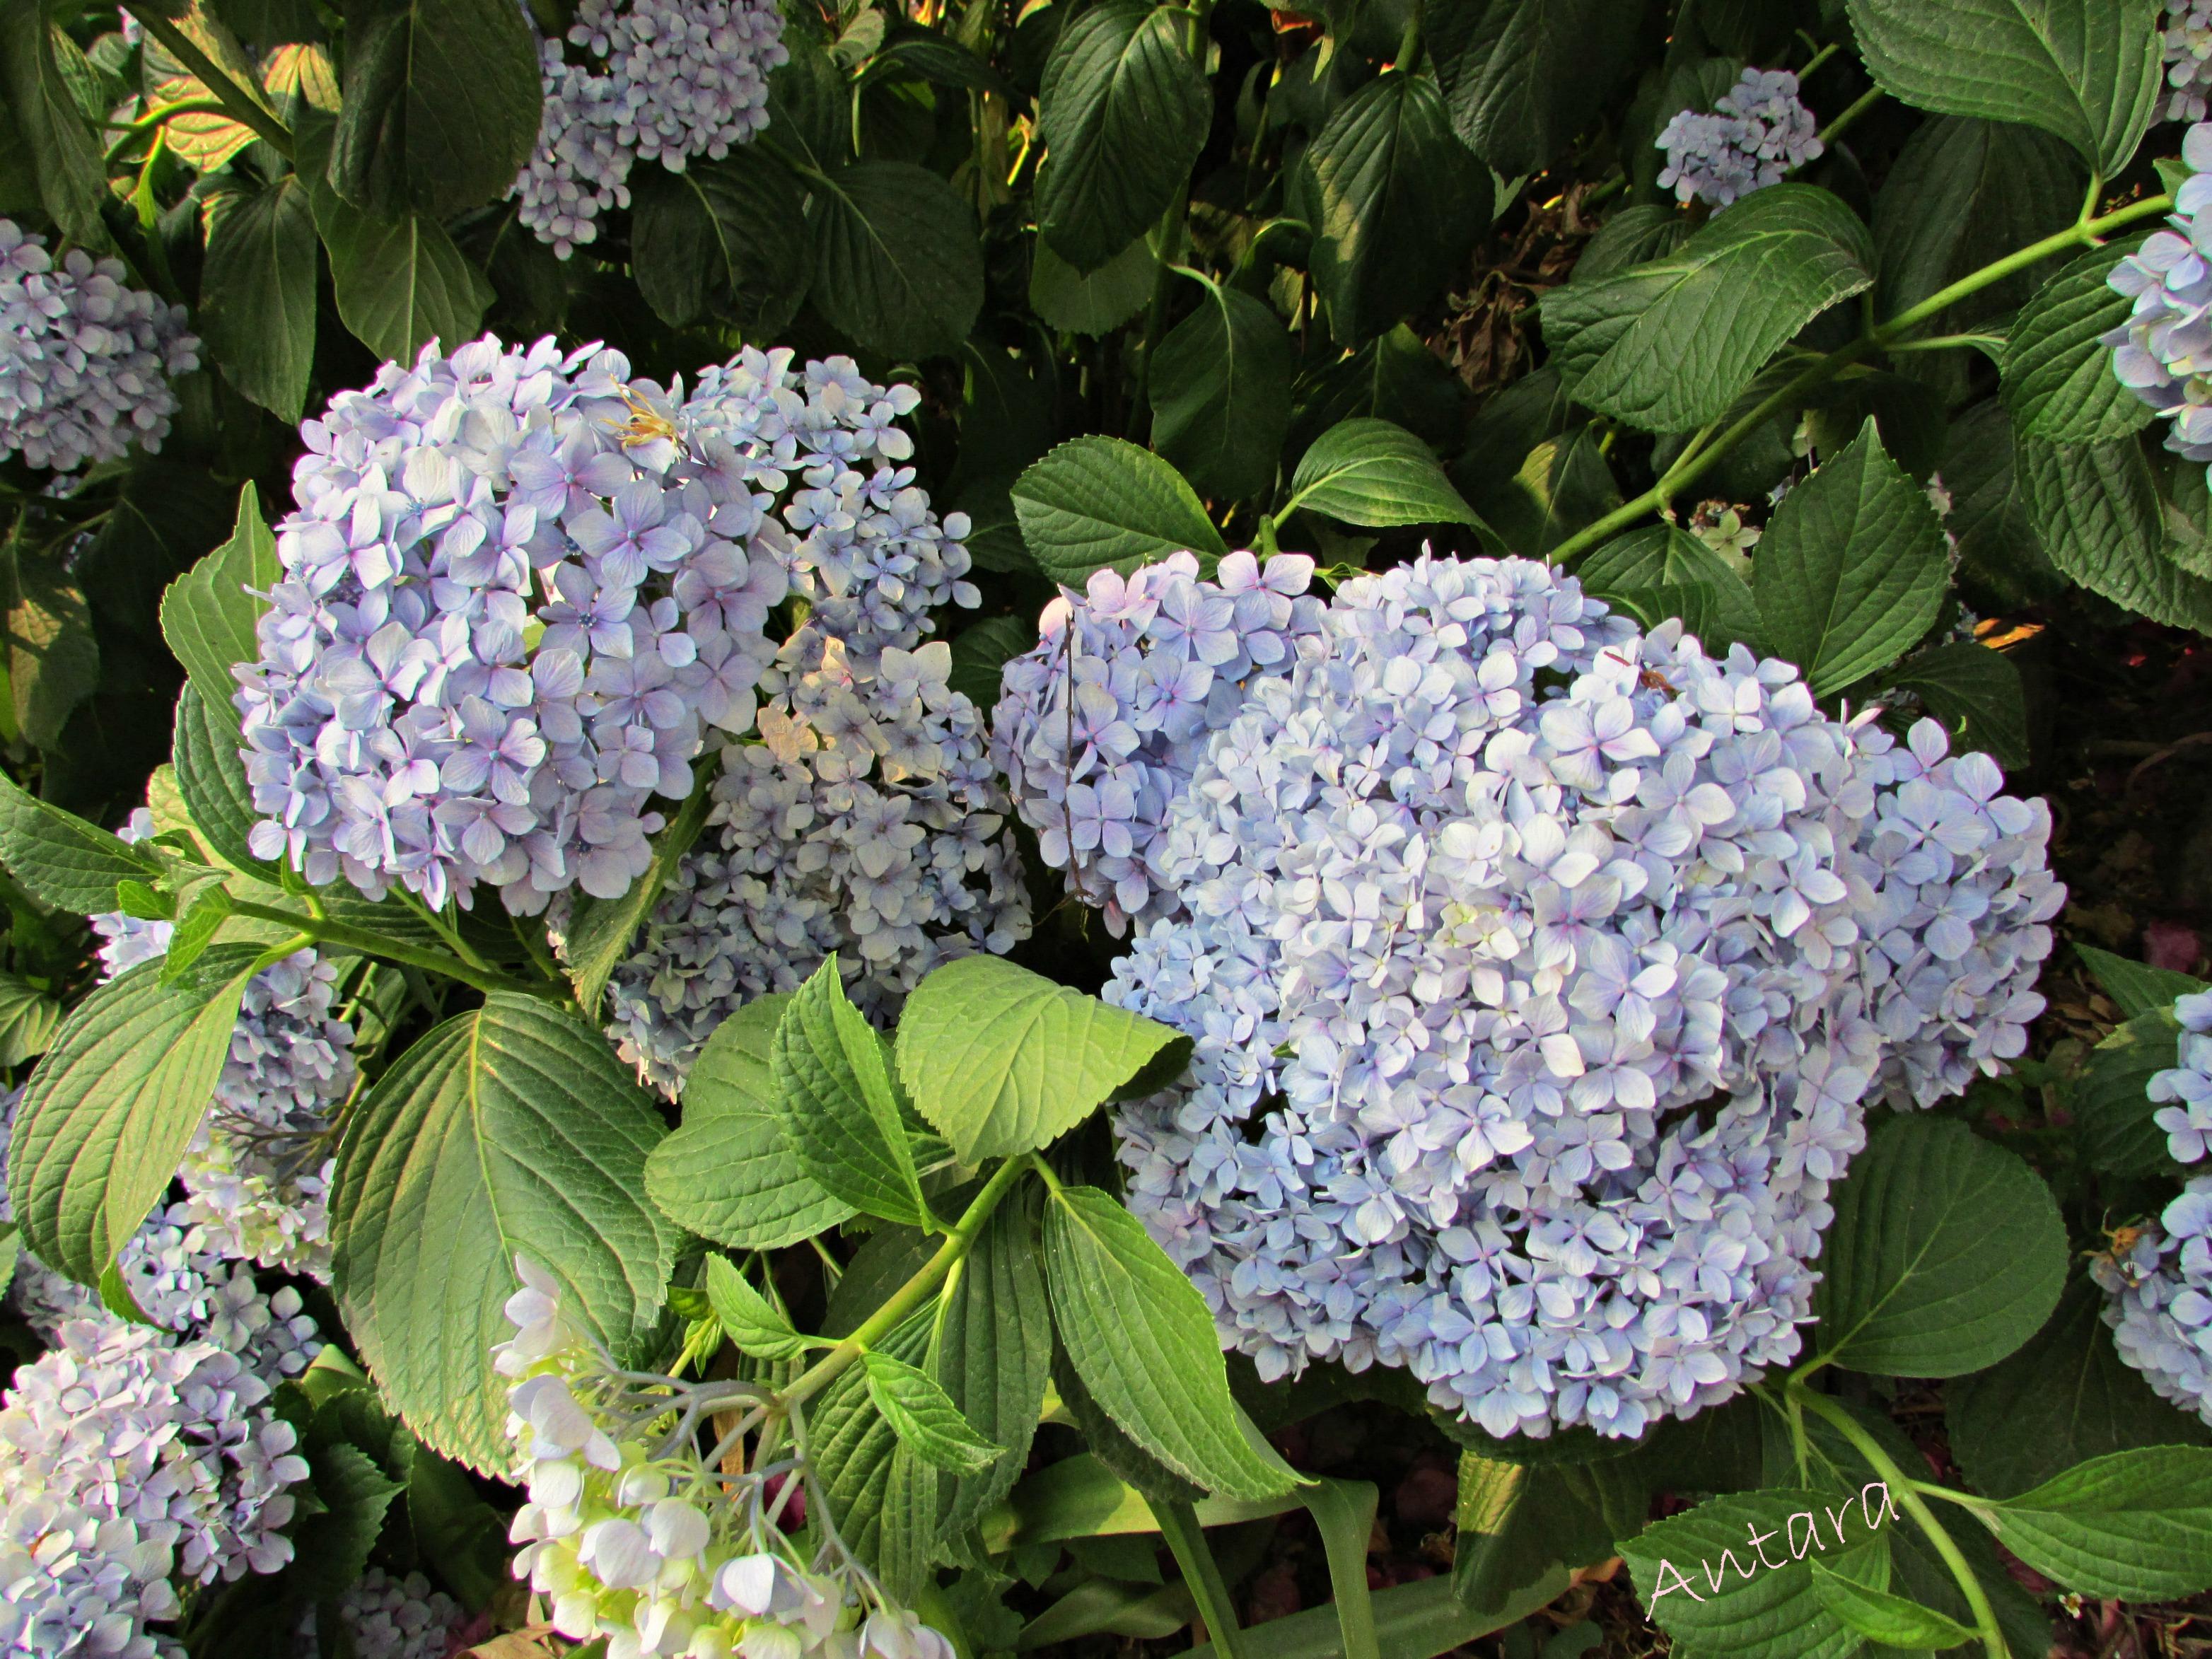 Hydringia flowers